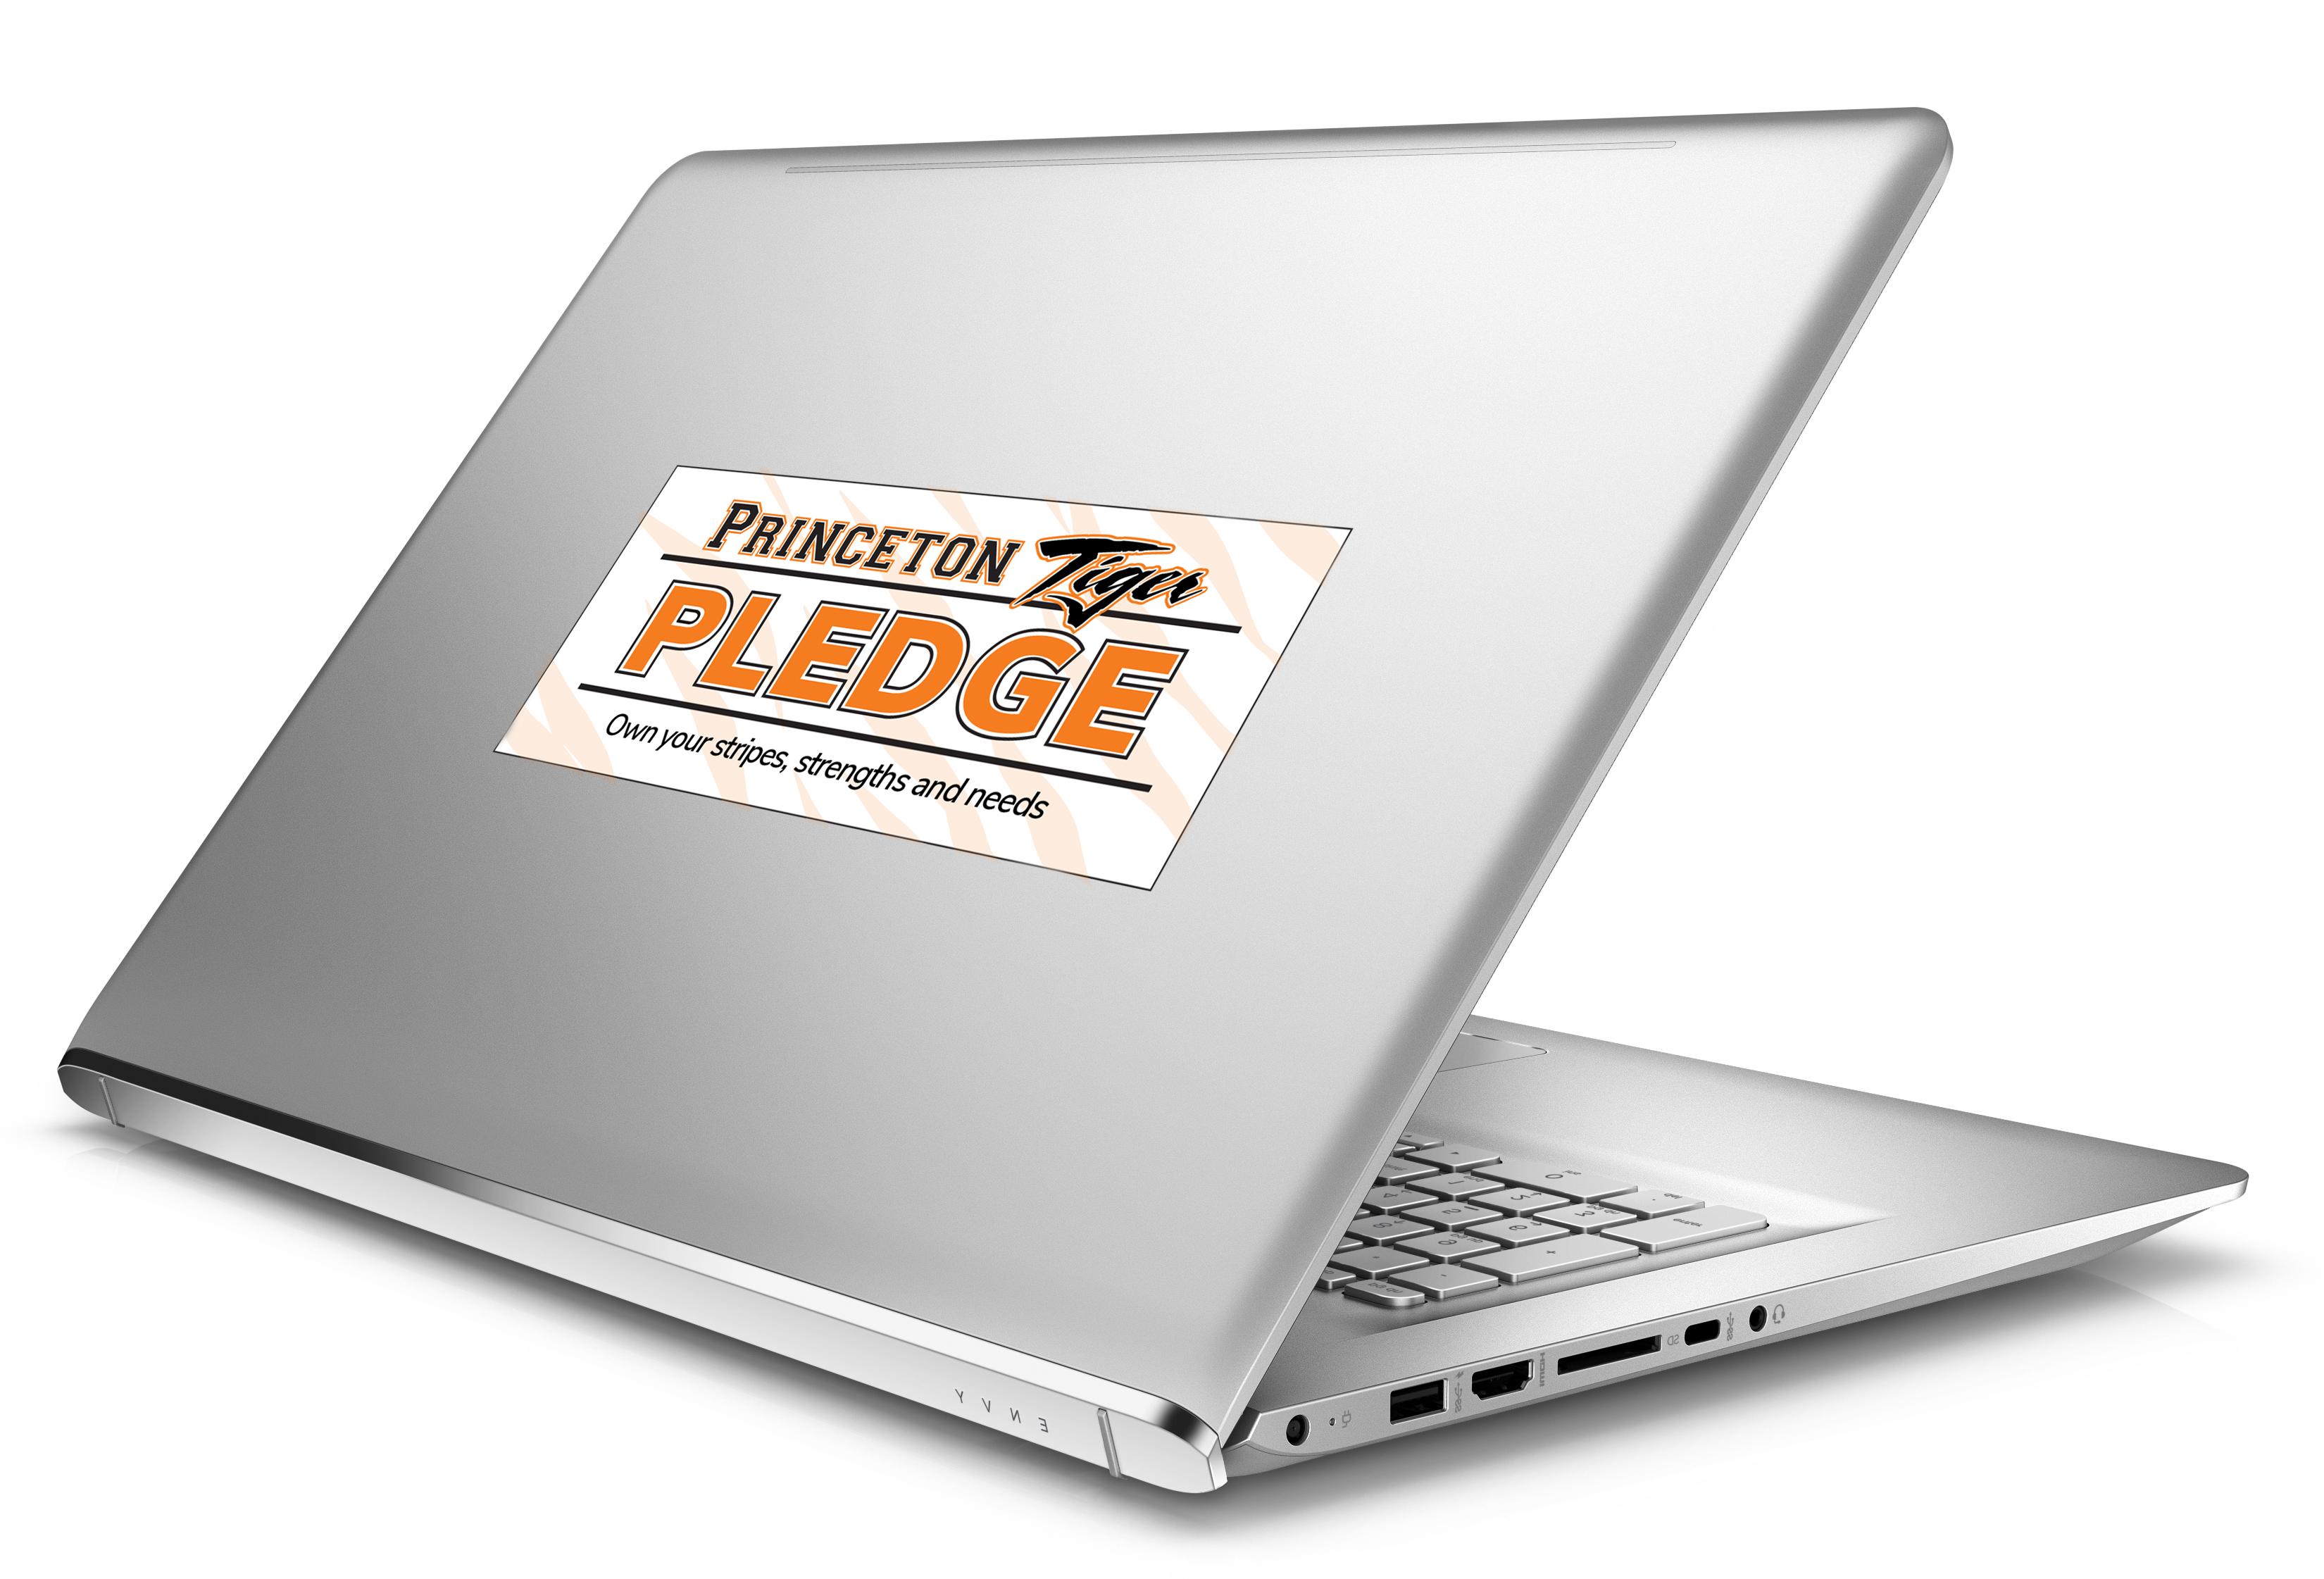 tiger pledge sticker on a laptop